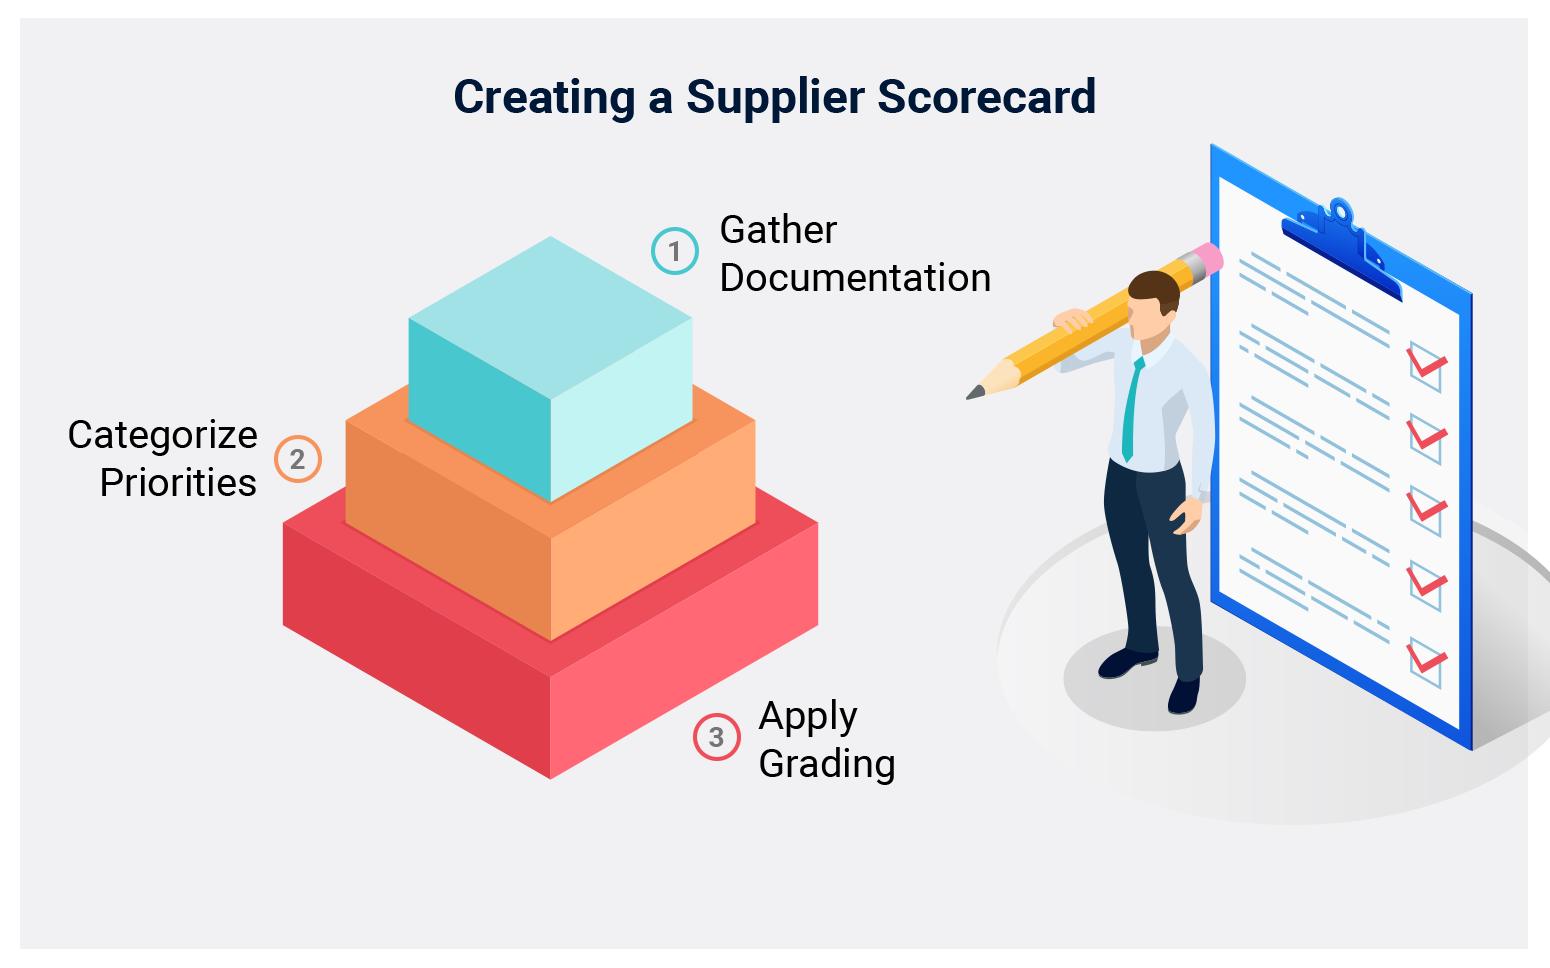 How to Create a Supplier Scorecard